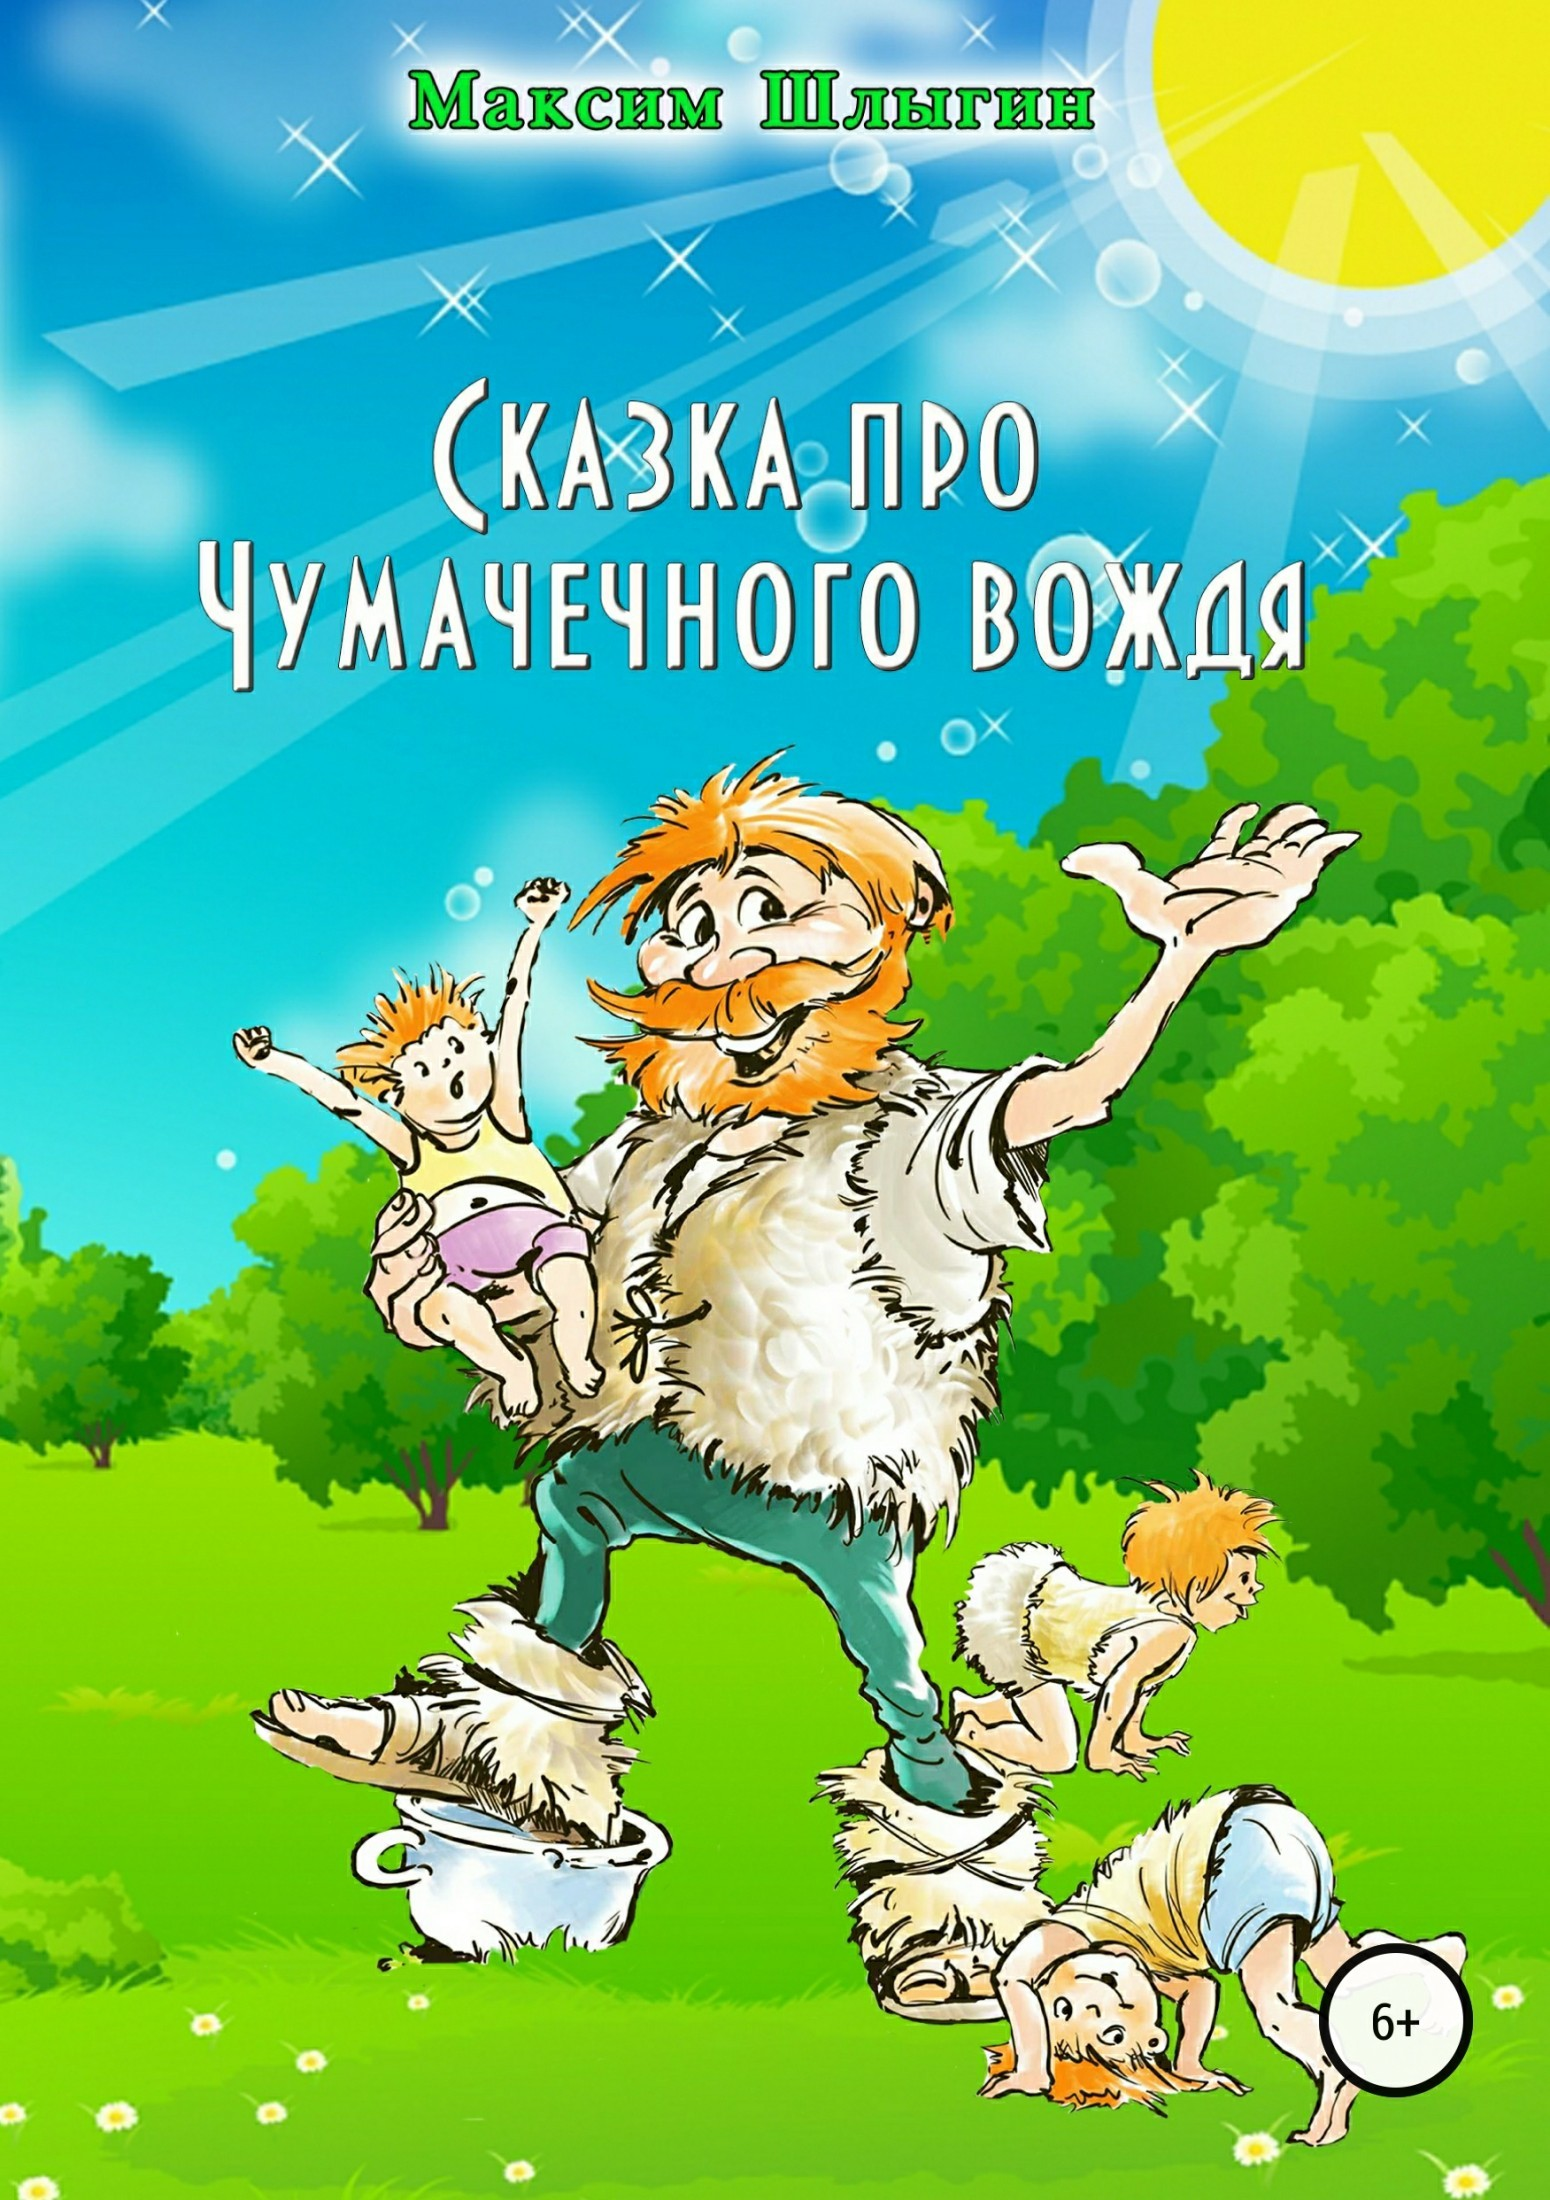 Максим Шлыгин Сказка про Чумачечного вождя раковина д тумбы iva 60